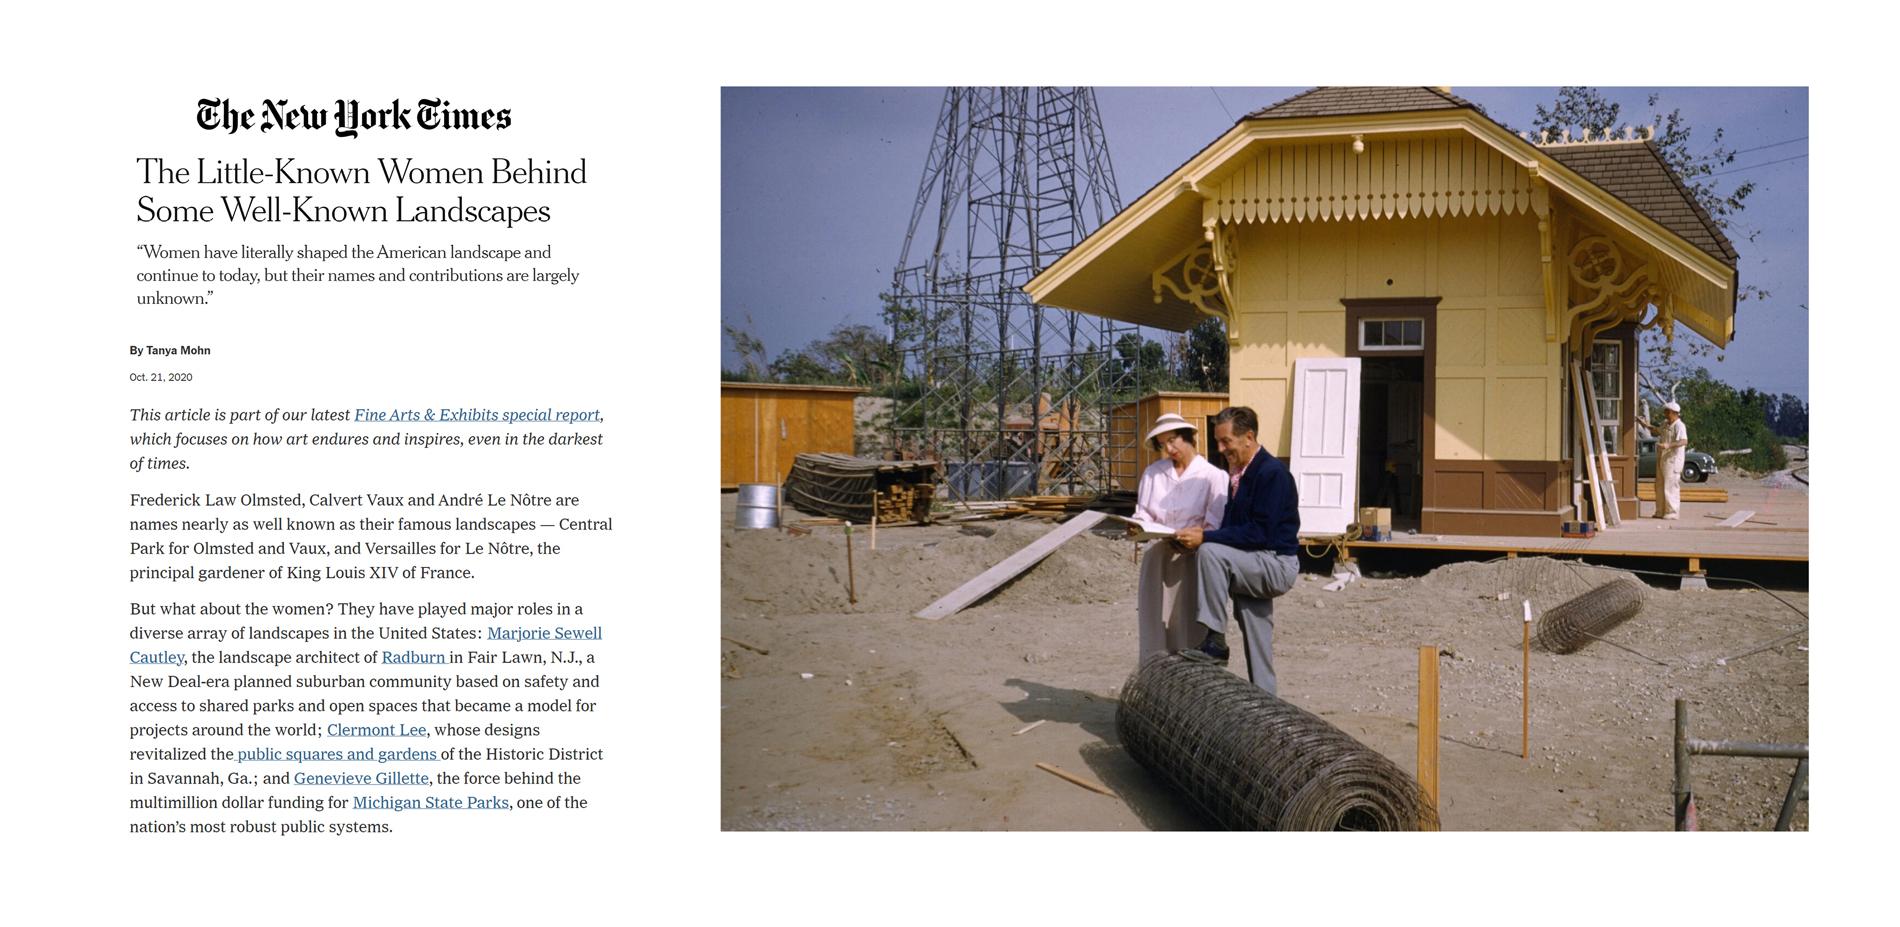 Landslide 2020: Women Take the Lead - Landslide 2020 Screen grab of New York Times coverage